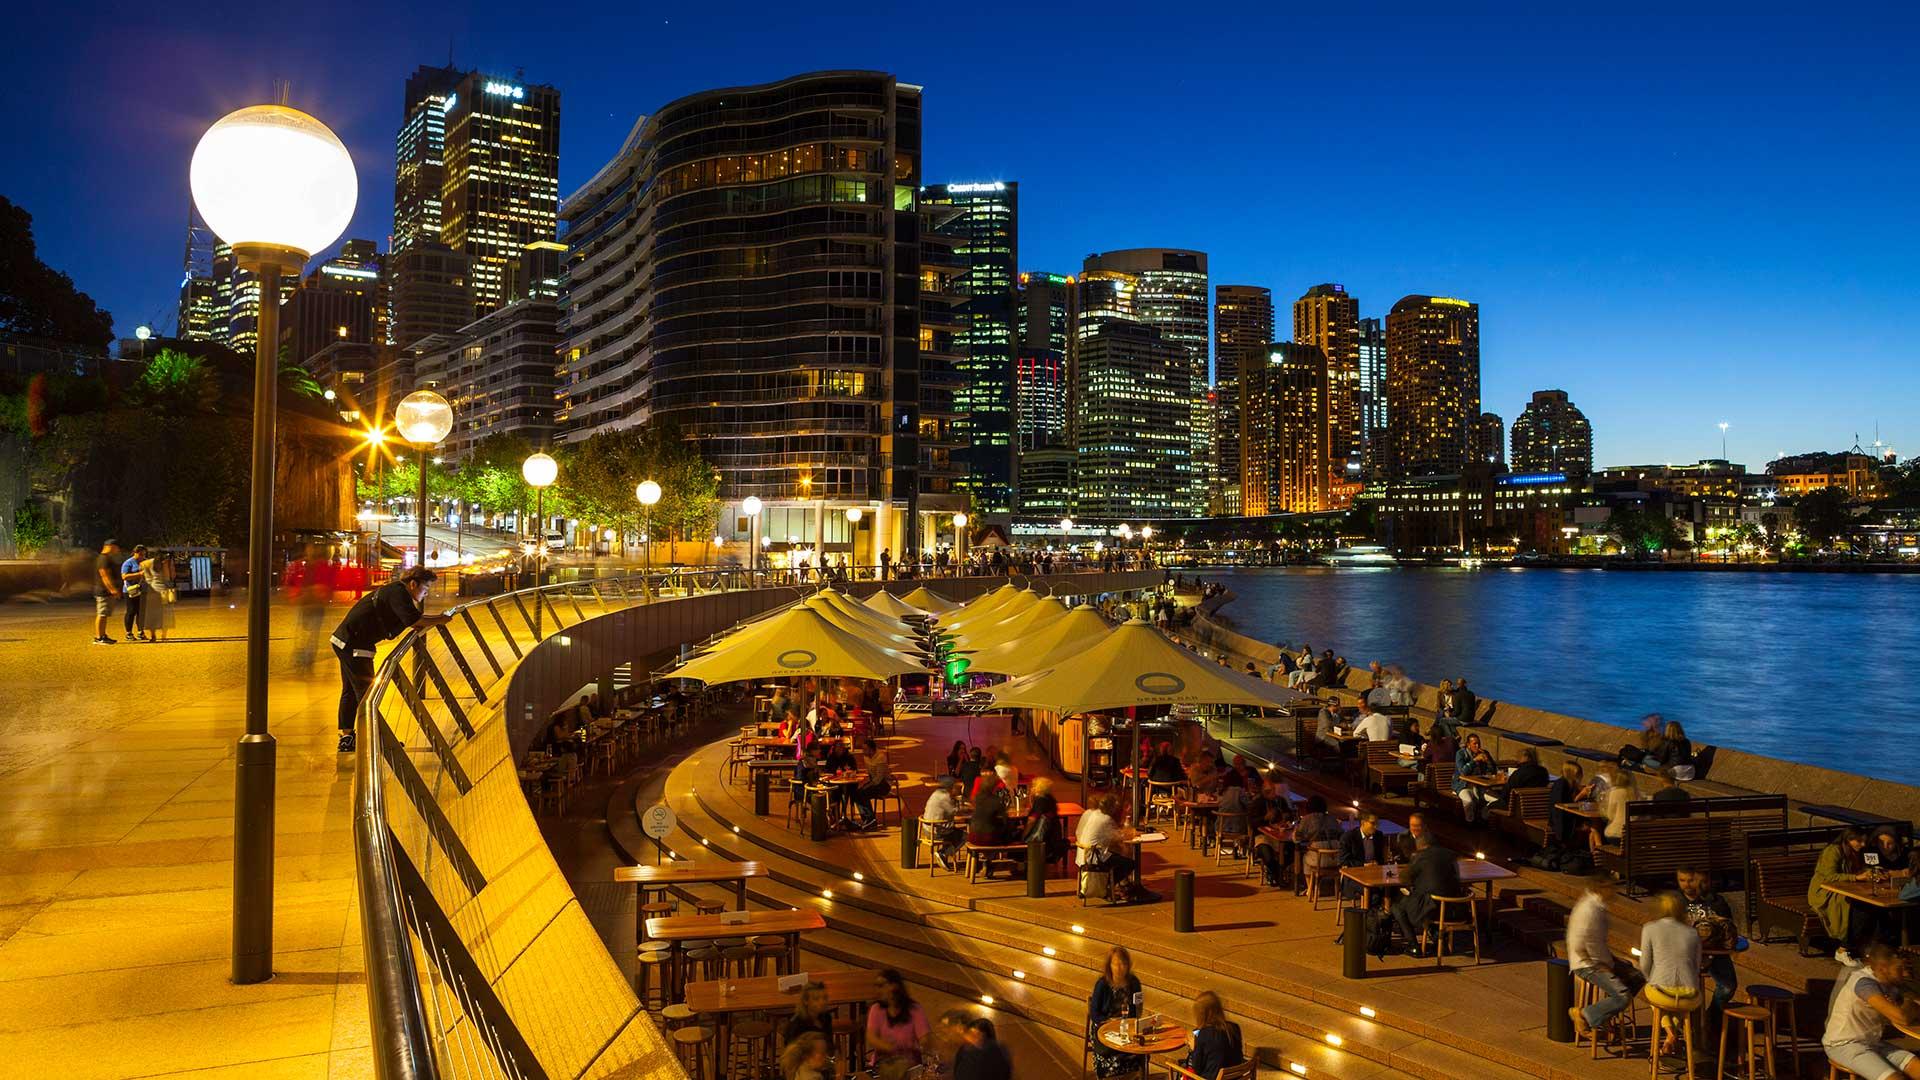 Darling Harbor, Sydney, New South Wales, Australia